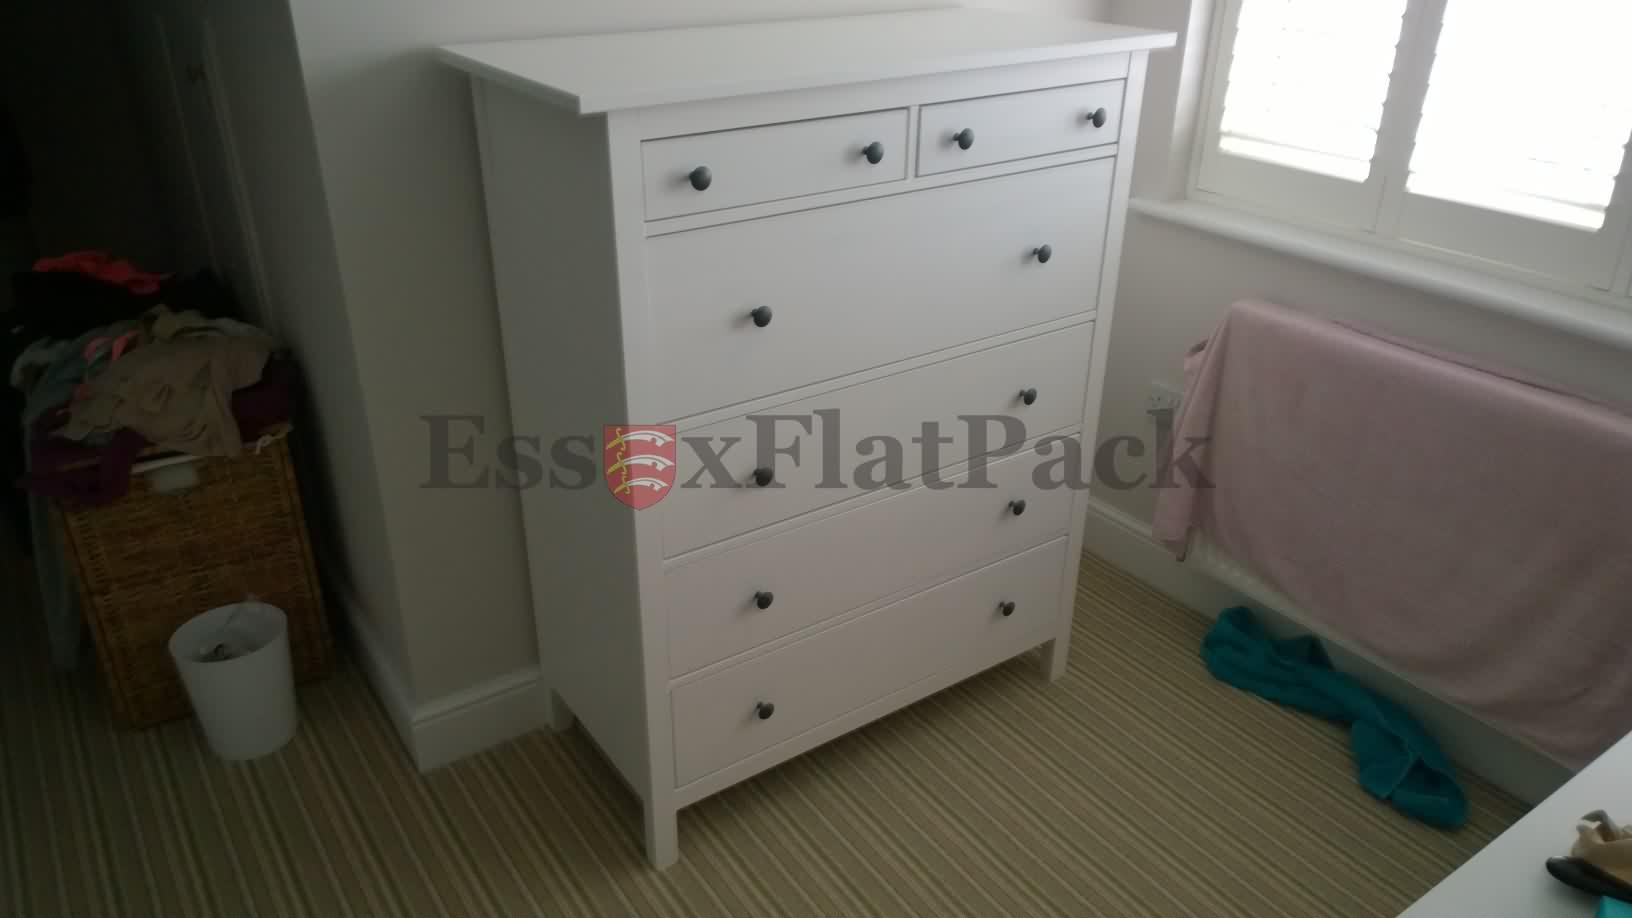 essexflatpack-furniture-20170223153957.jpg